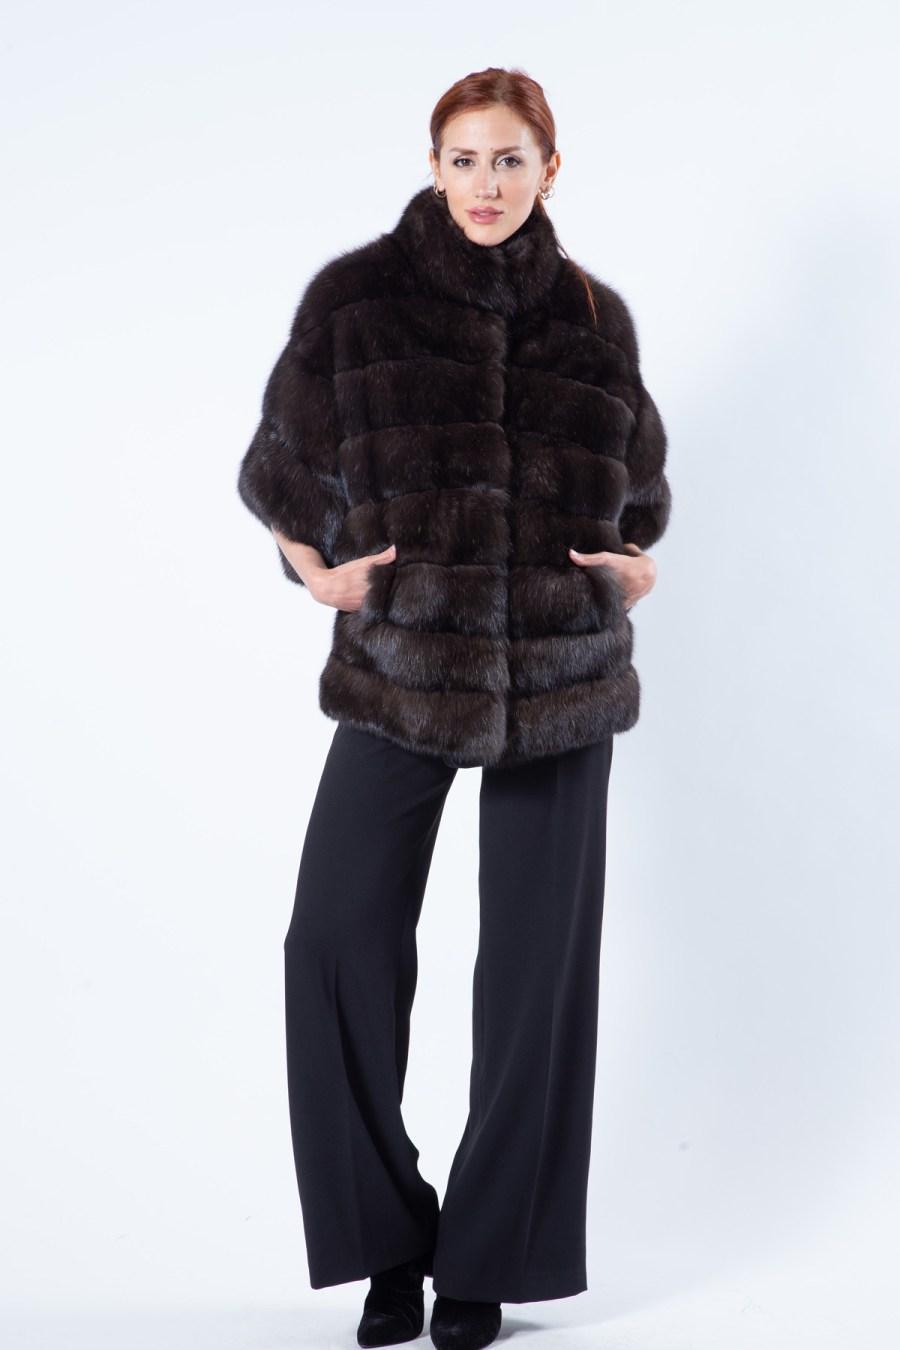 Silvery Sable Fur Cape | Sarigianni Furs